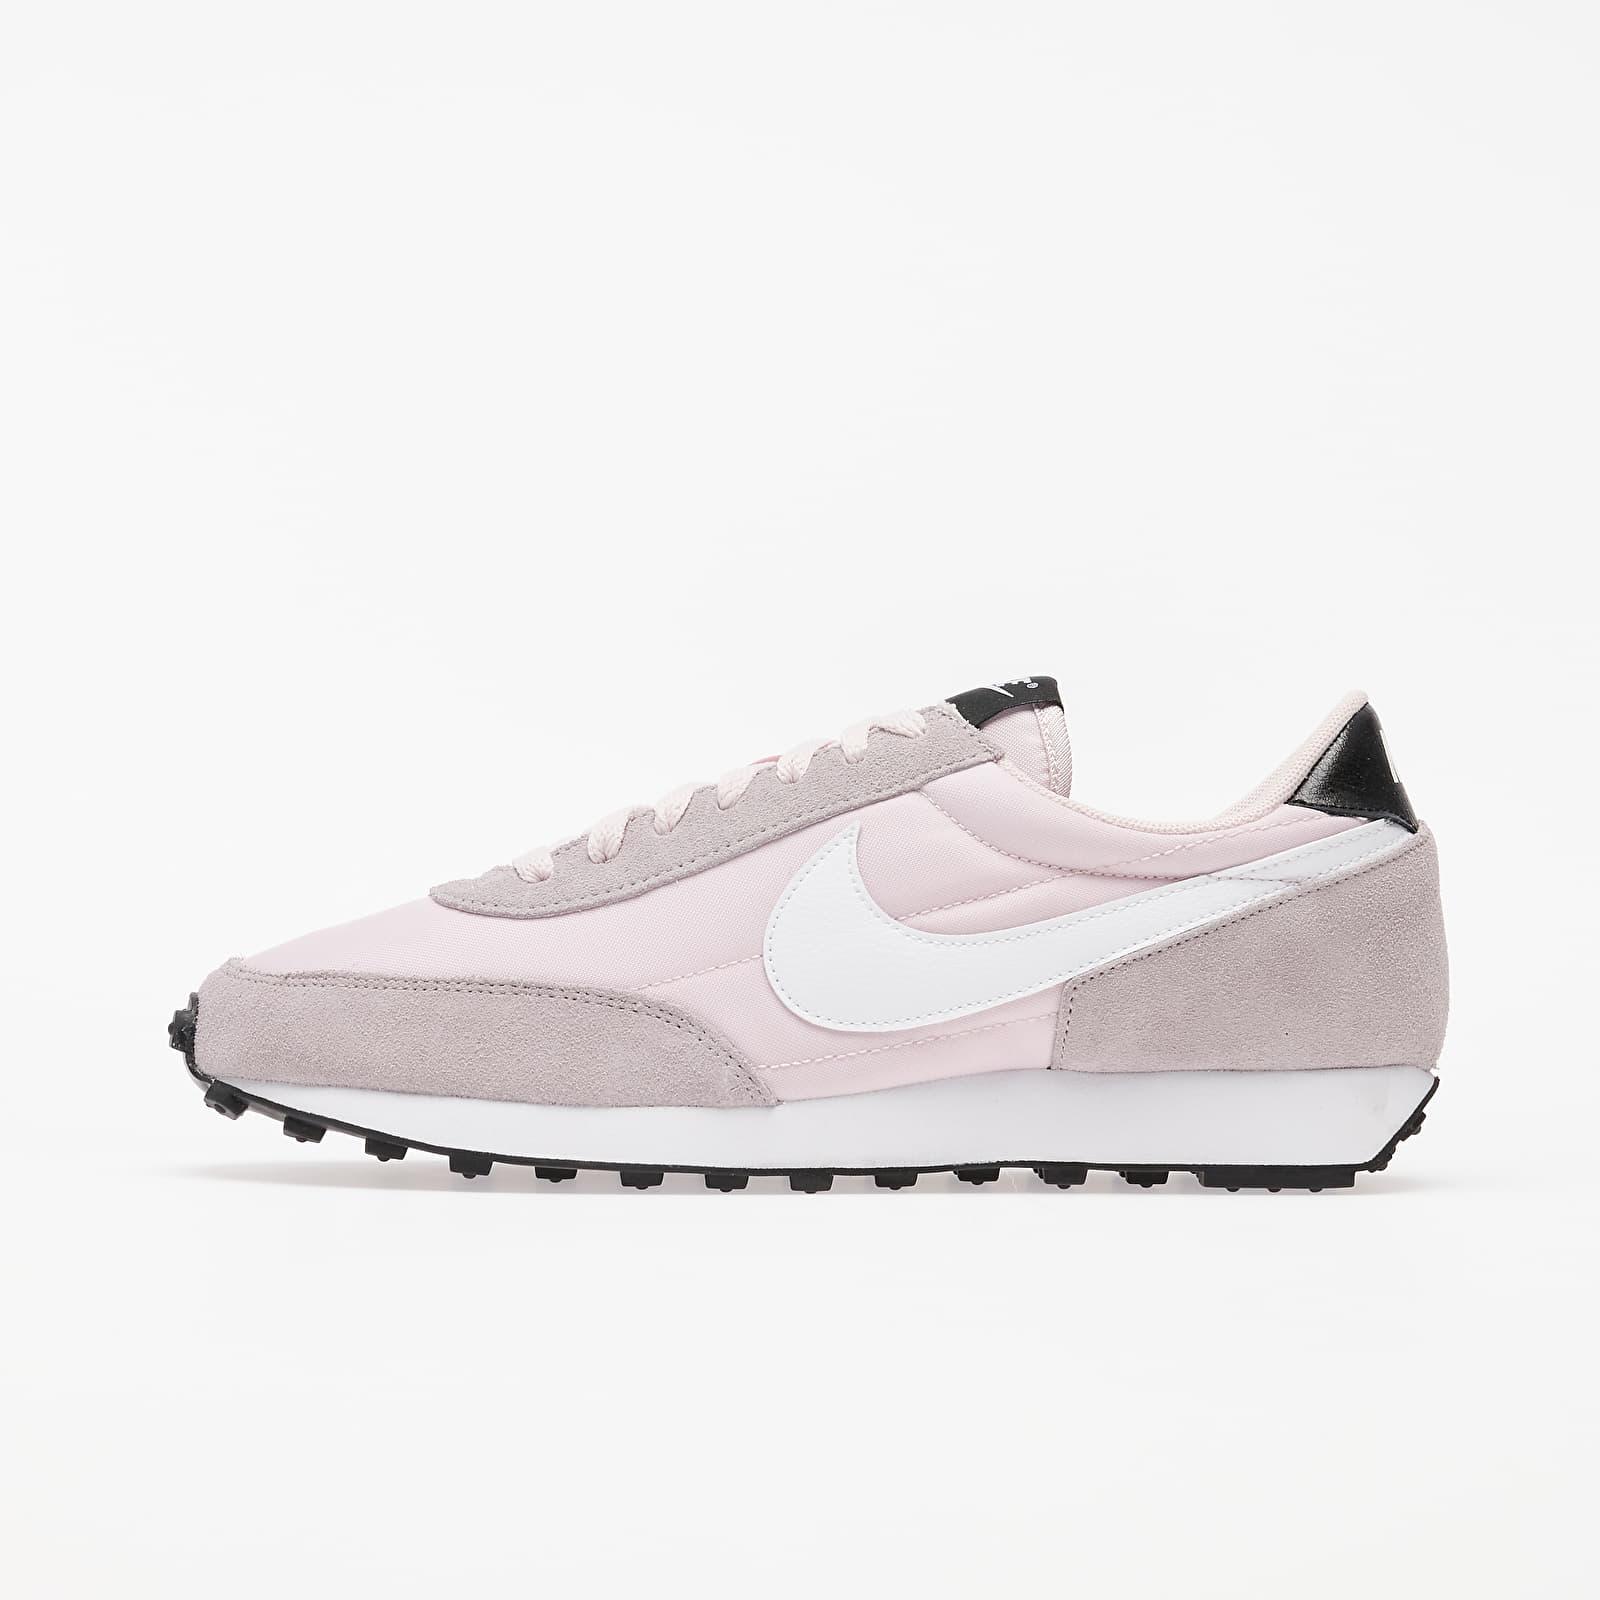 Dámské tenisky a boty Nike W Dbreak Barely Rose/ White-Silver Lilac-Black